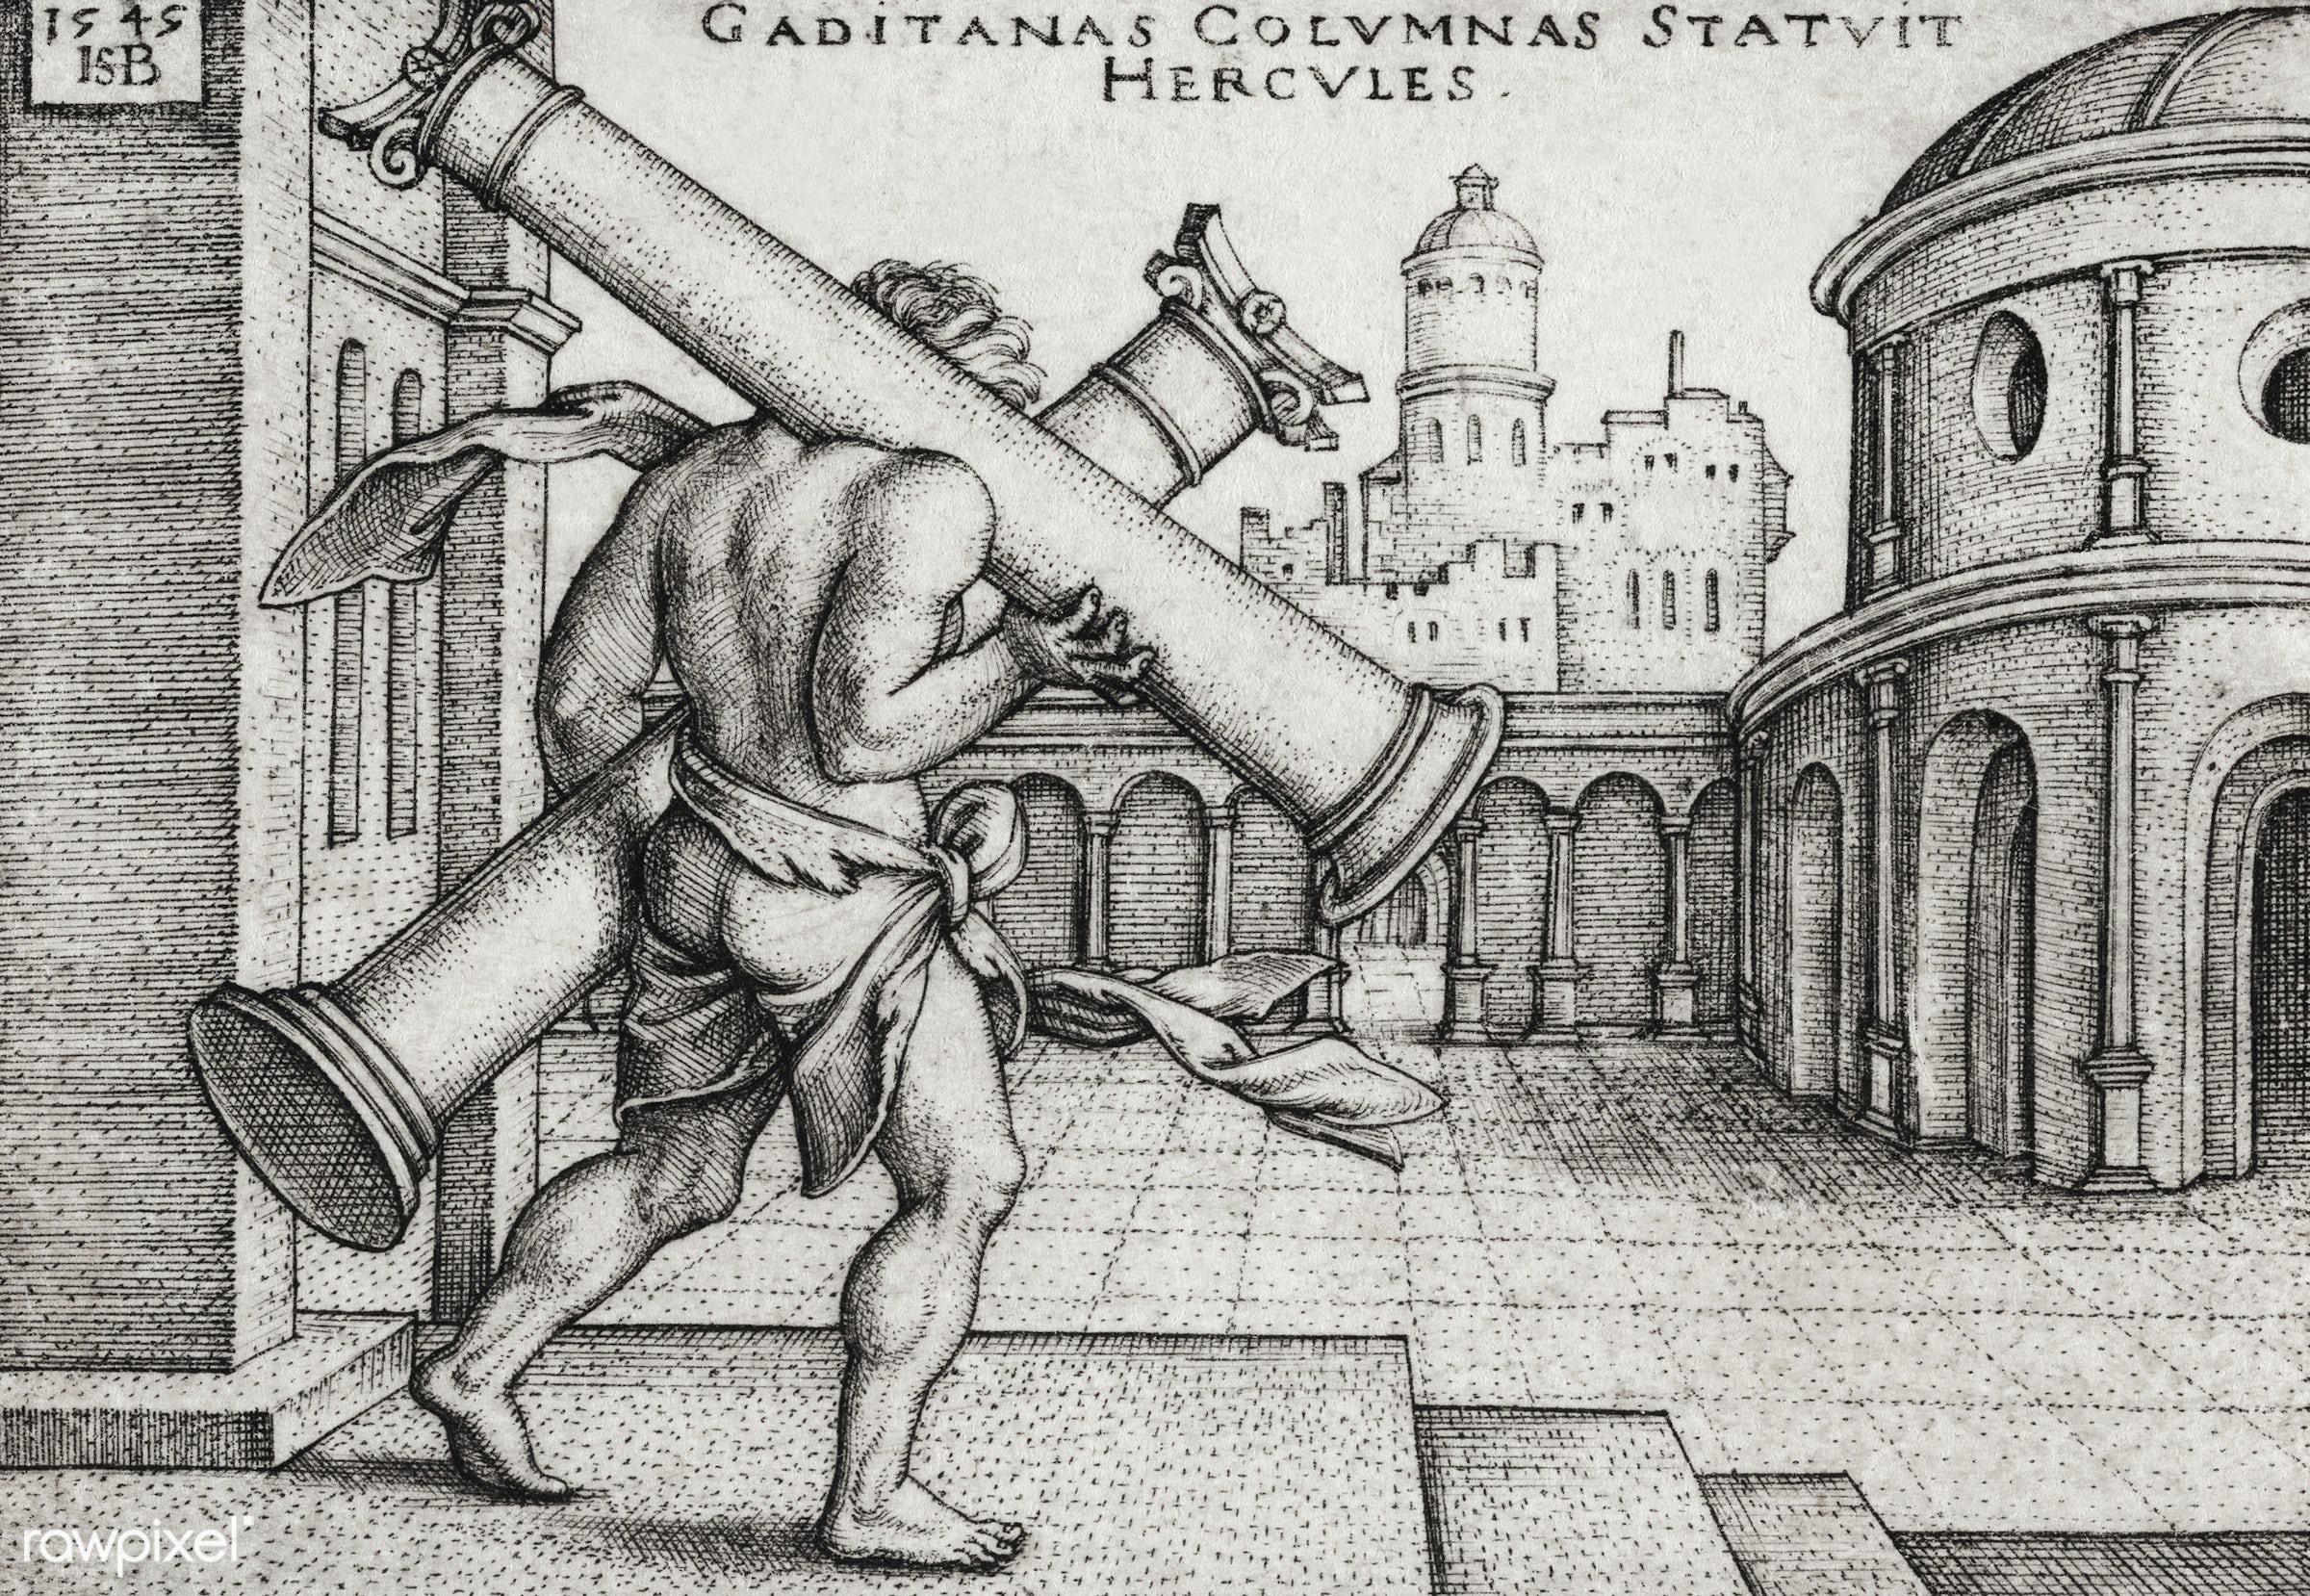 Vintage illustration of Hercules and the Columns of Gaza published in 1545 by Hans Sebald Beham (1500-1550) - antique,...